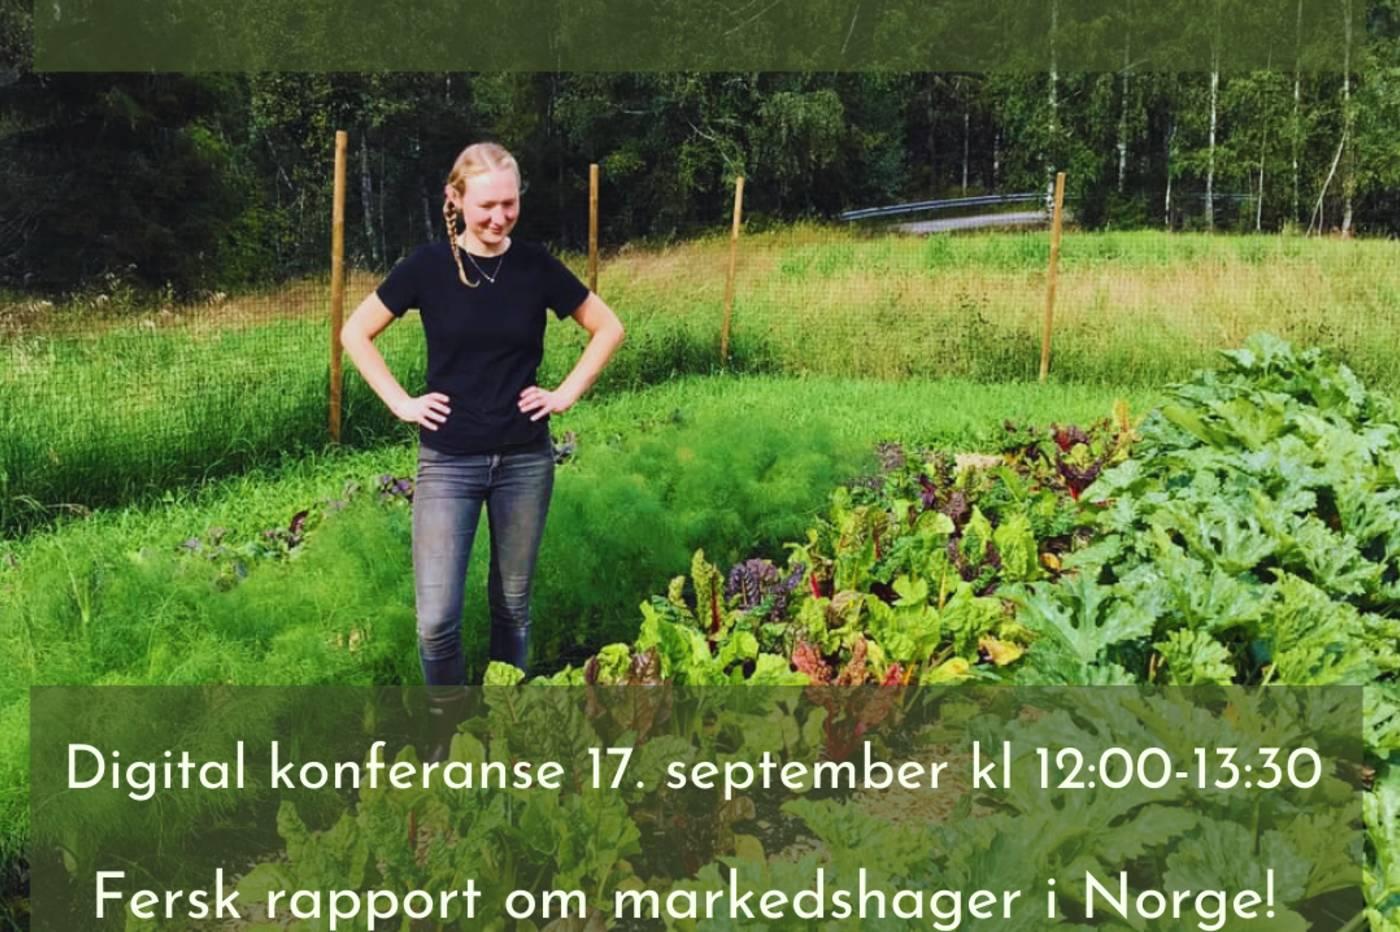 Robust Småskala Grønt - oppstartkonferanse 17.september